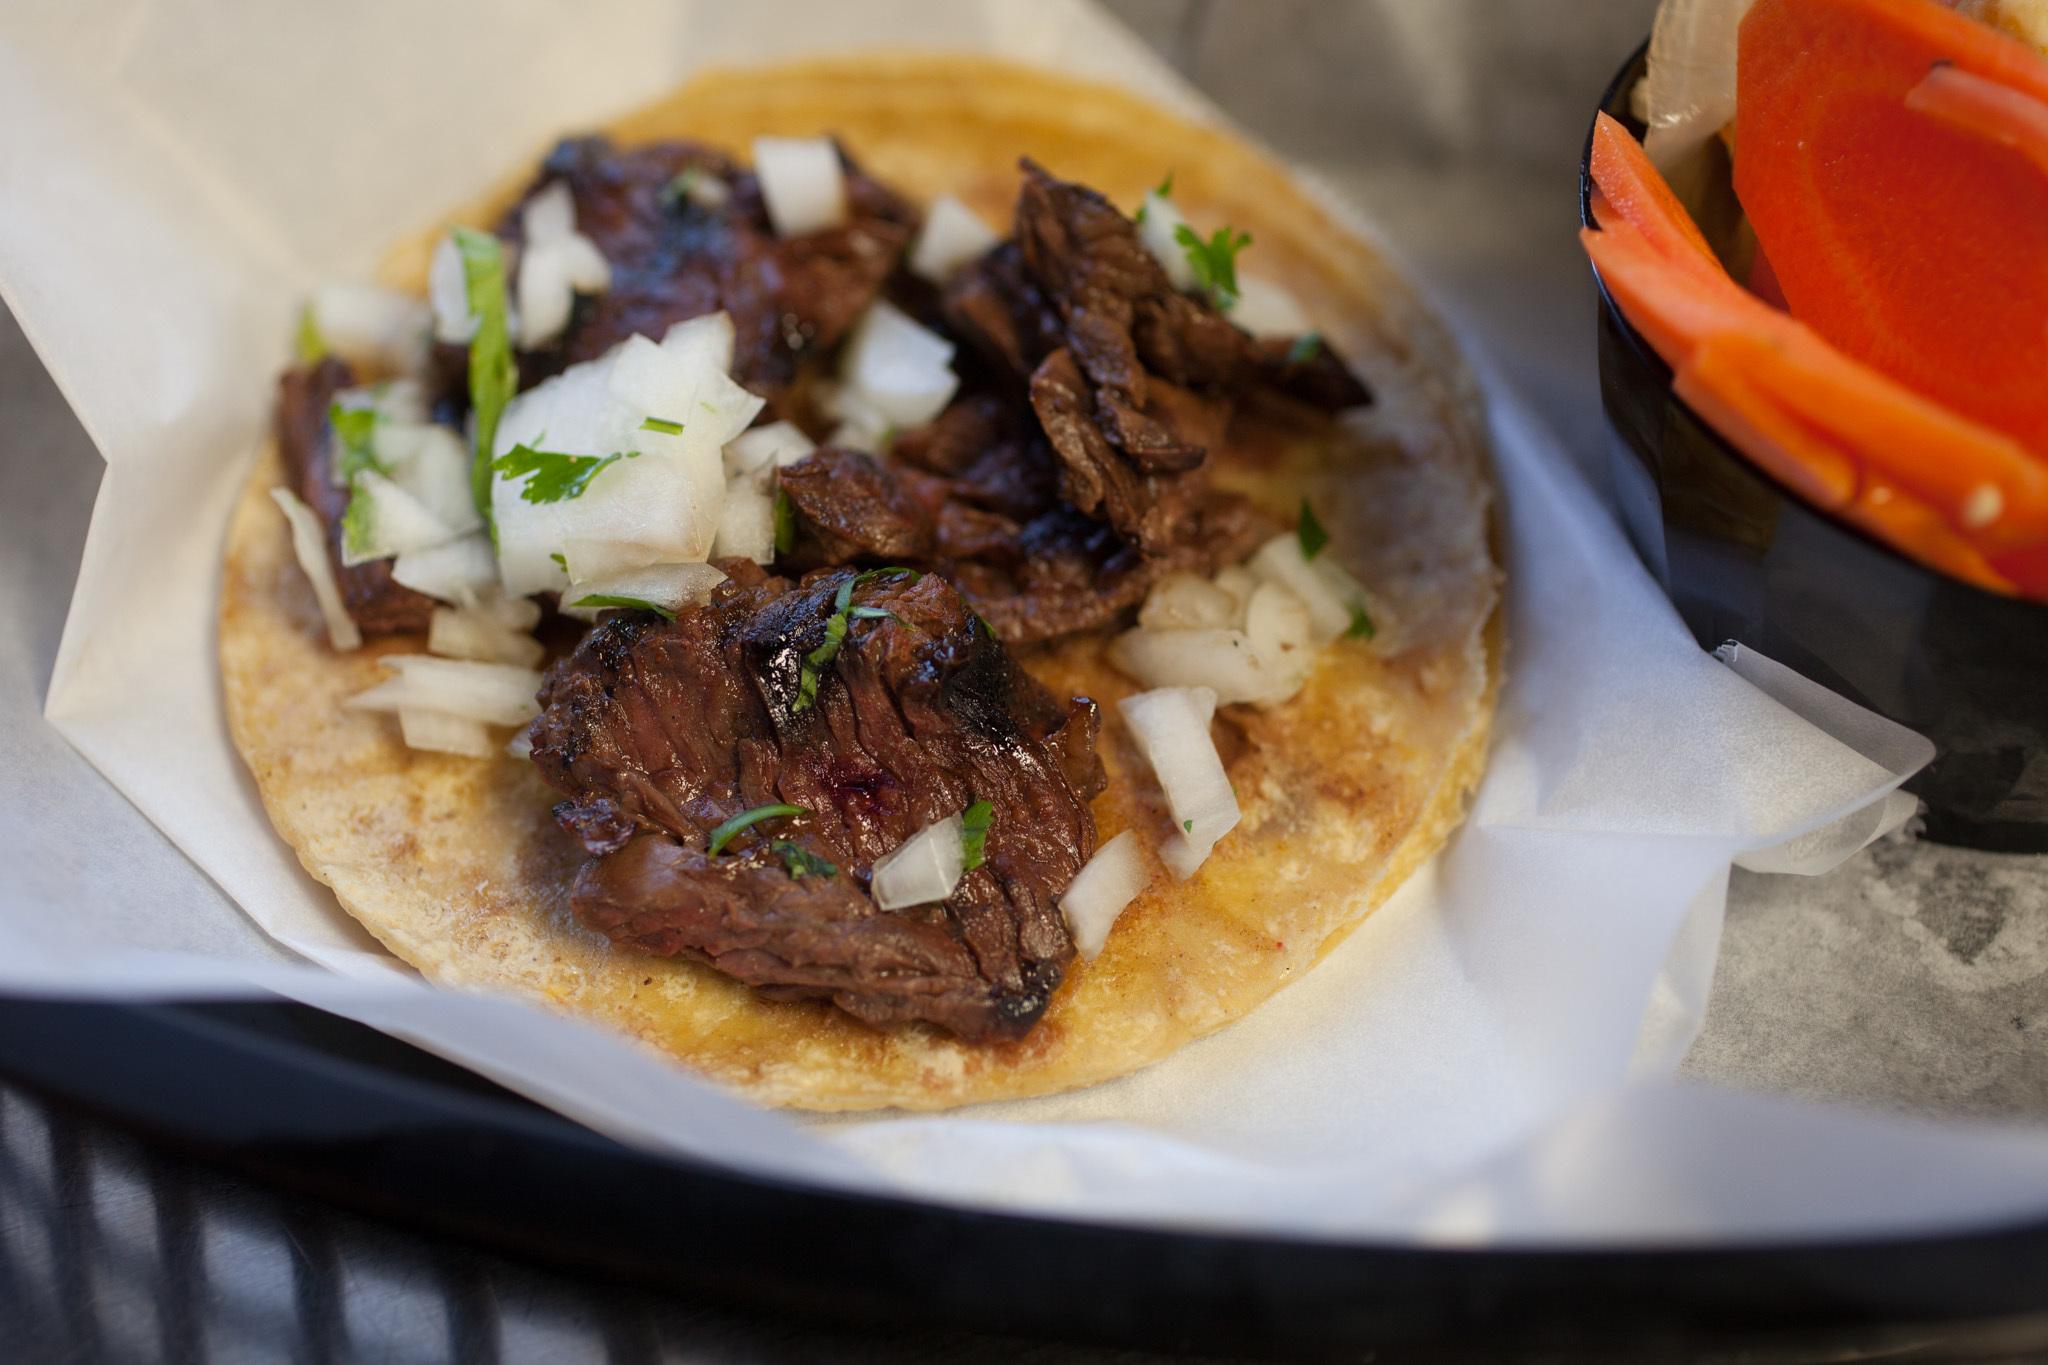 Carne Asada taco at L'Patron.